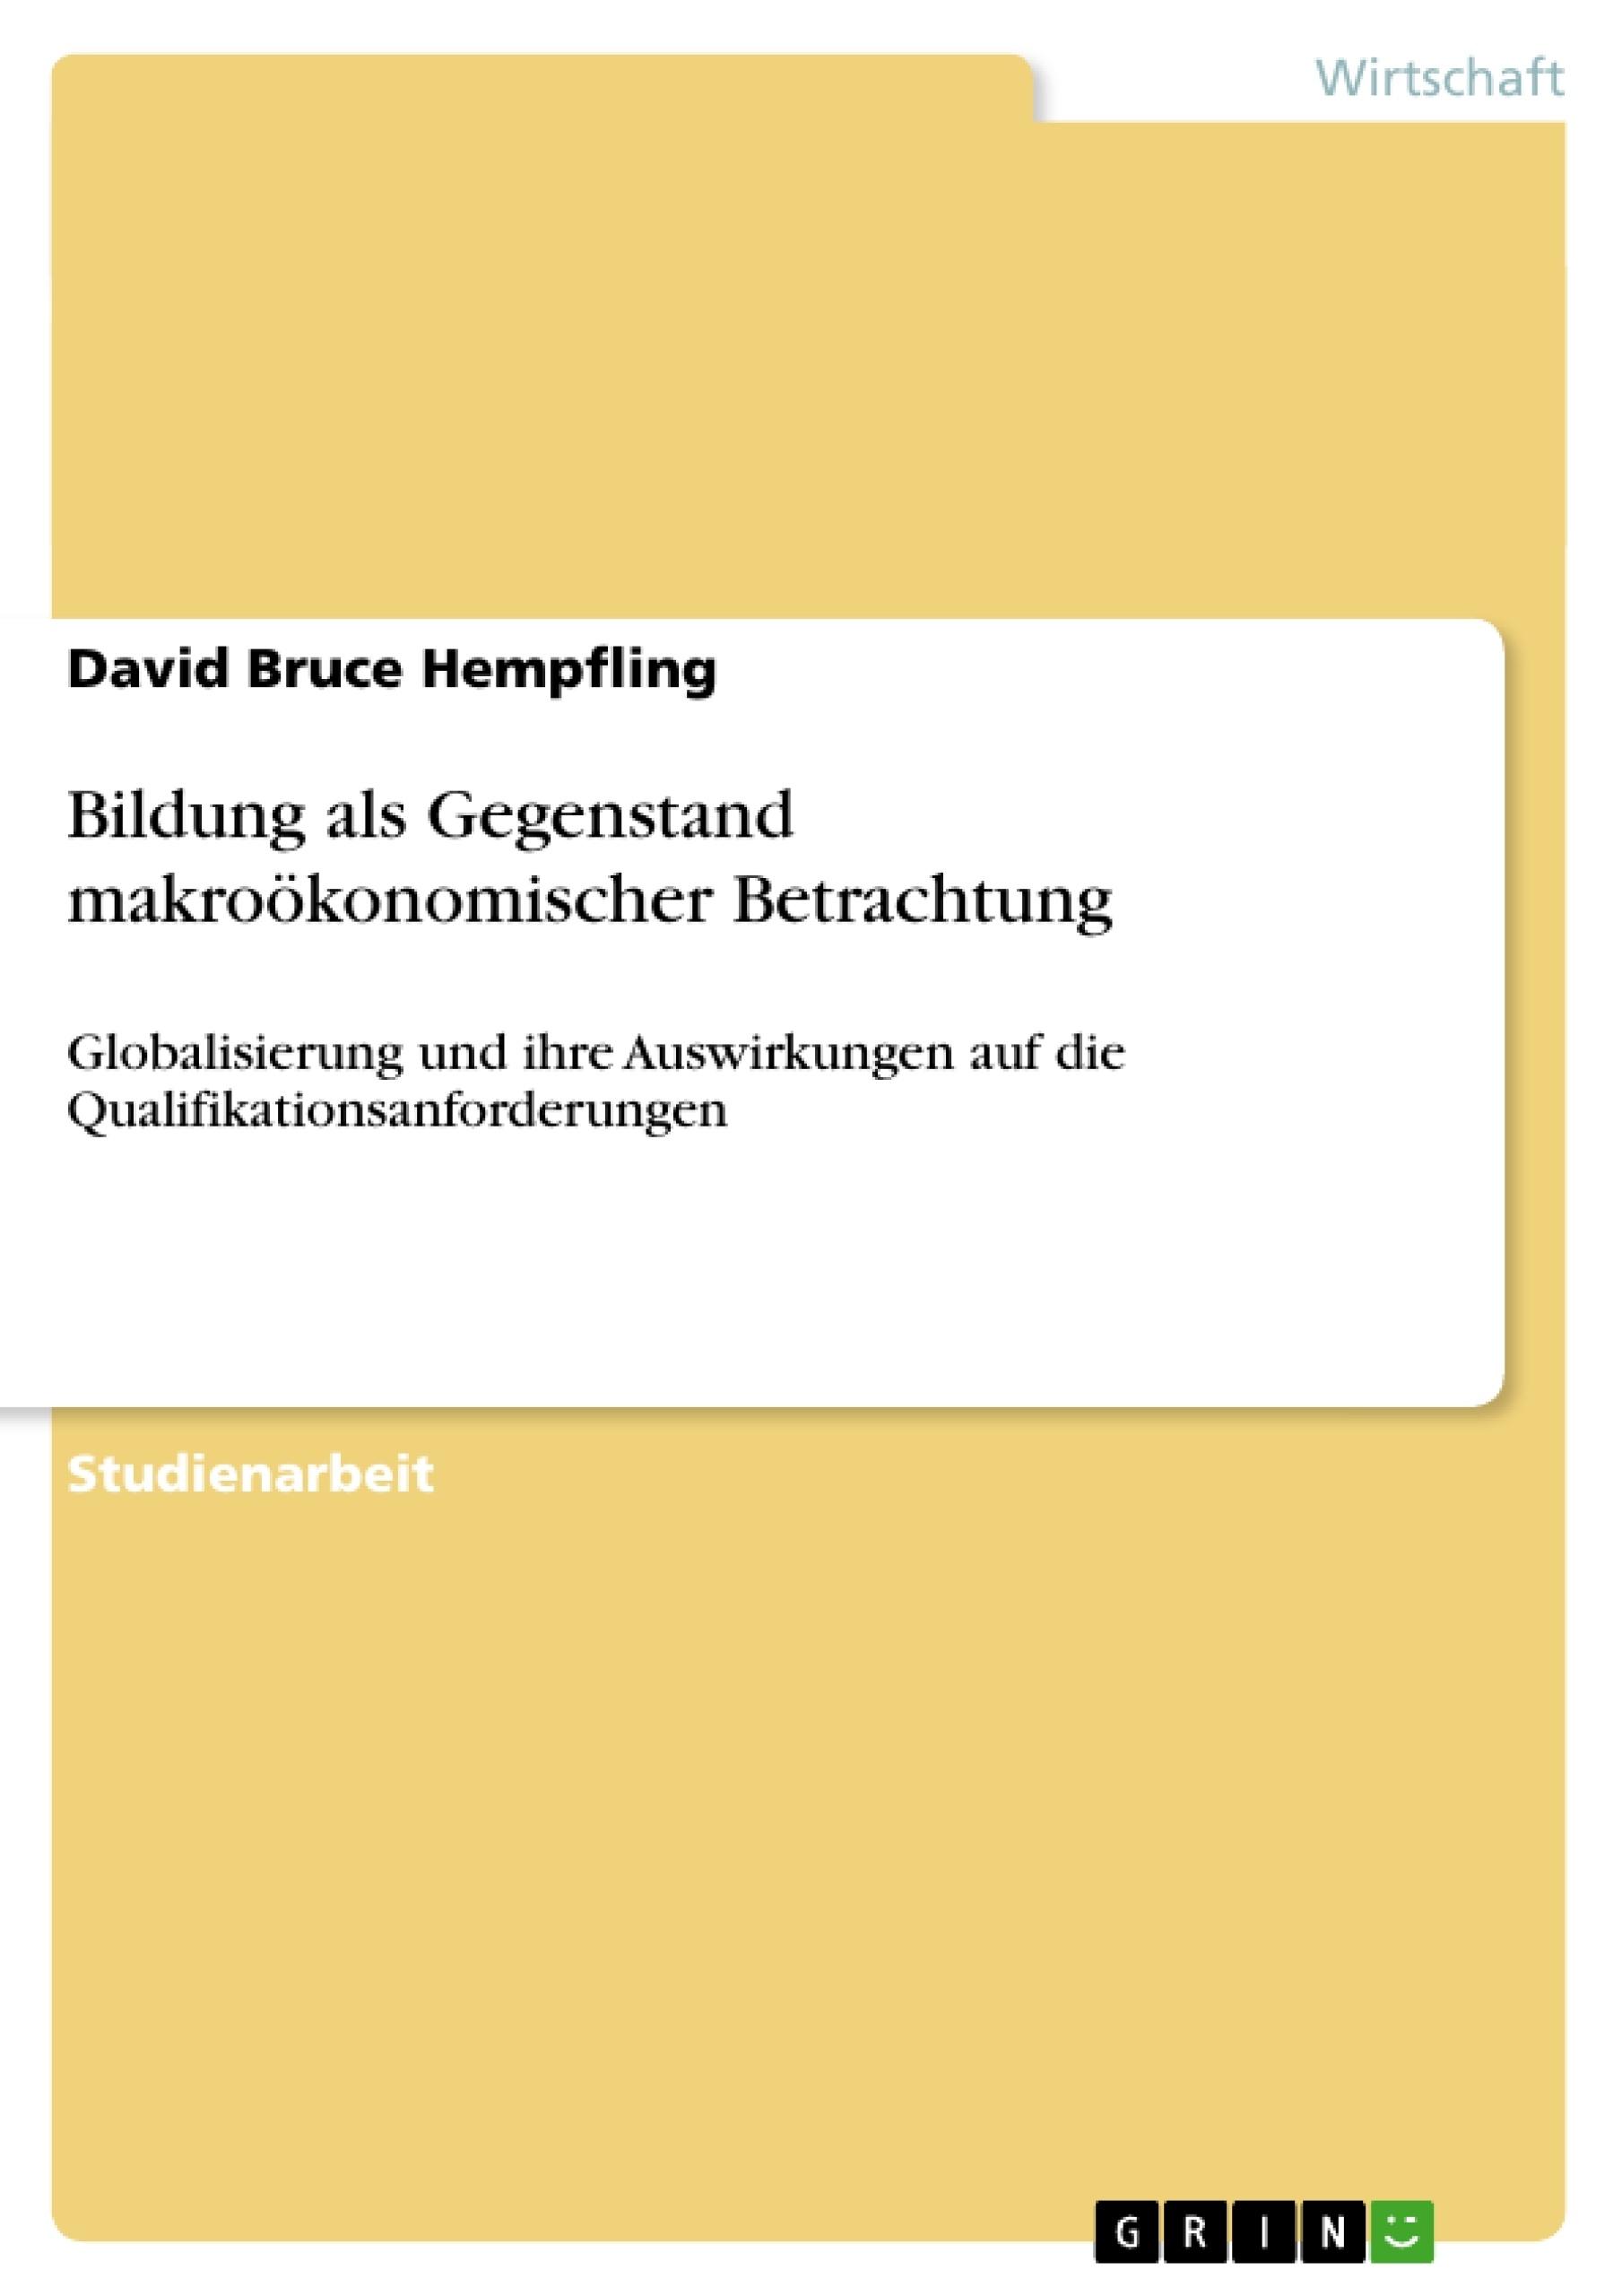 Titel: Bildung als Gegenstand makroökonomischer Betrachtung